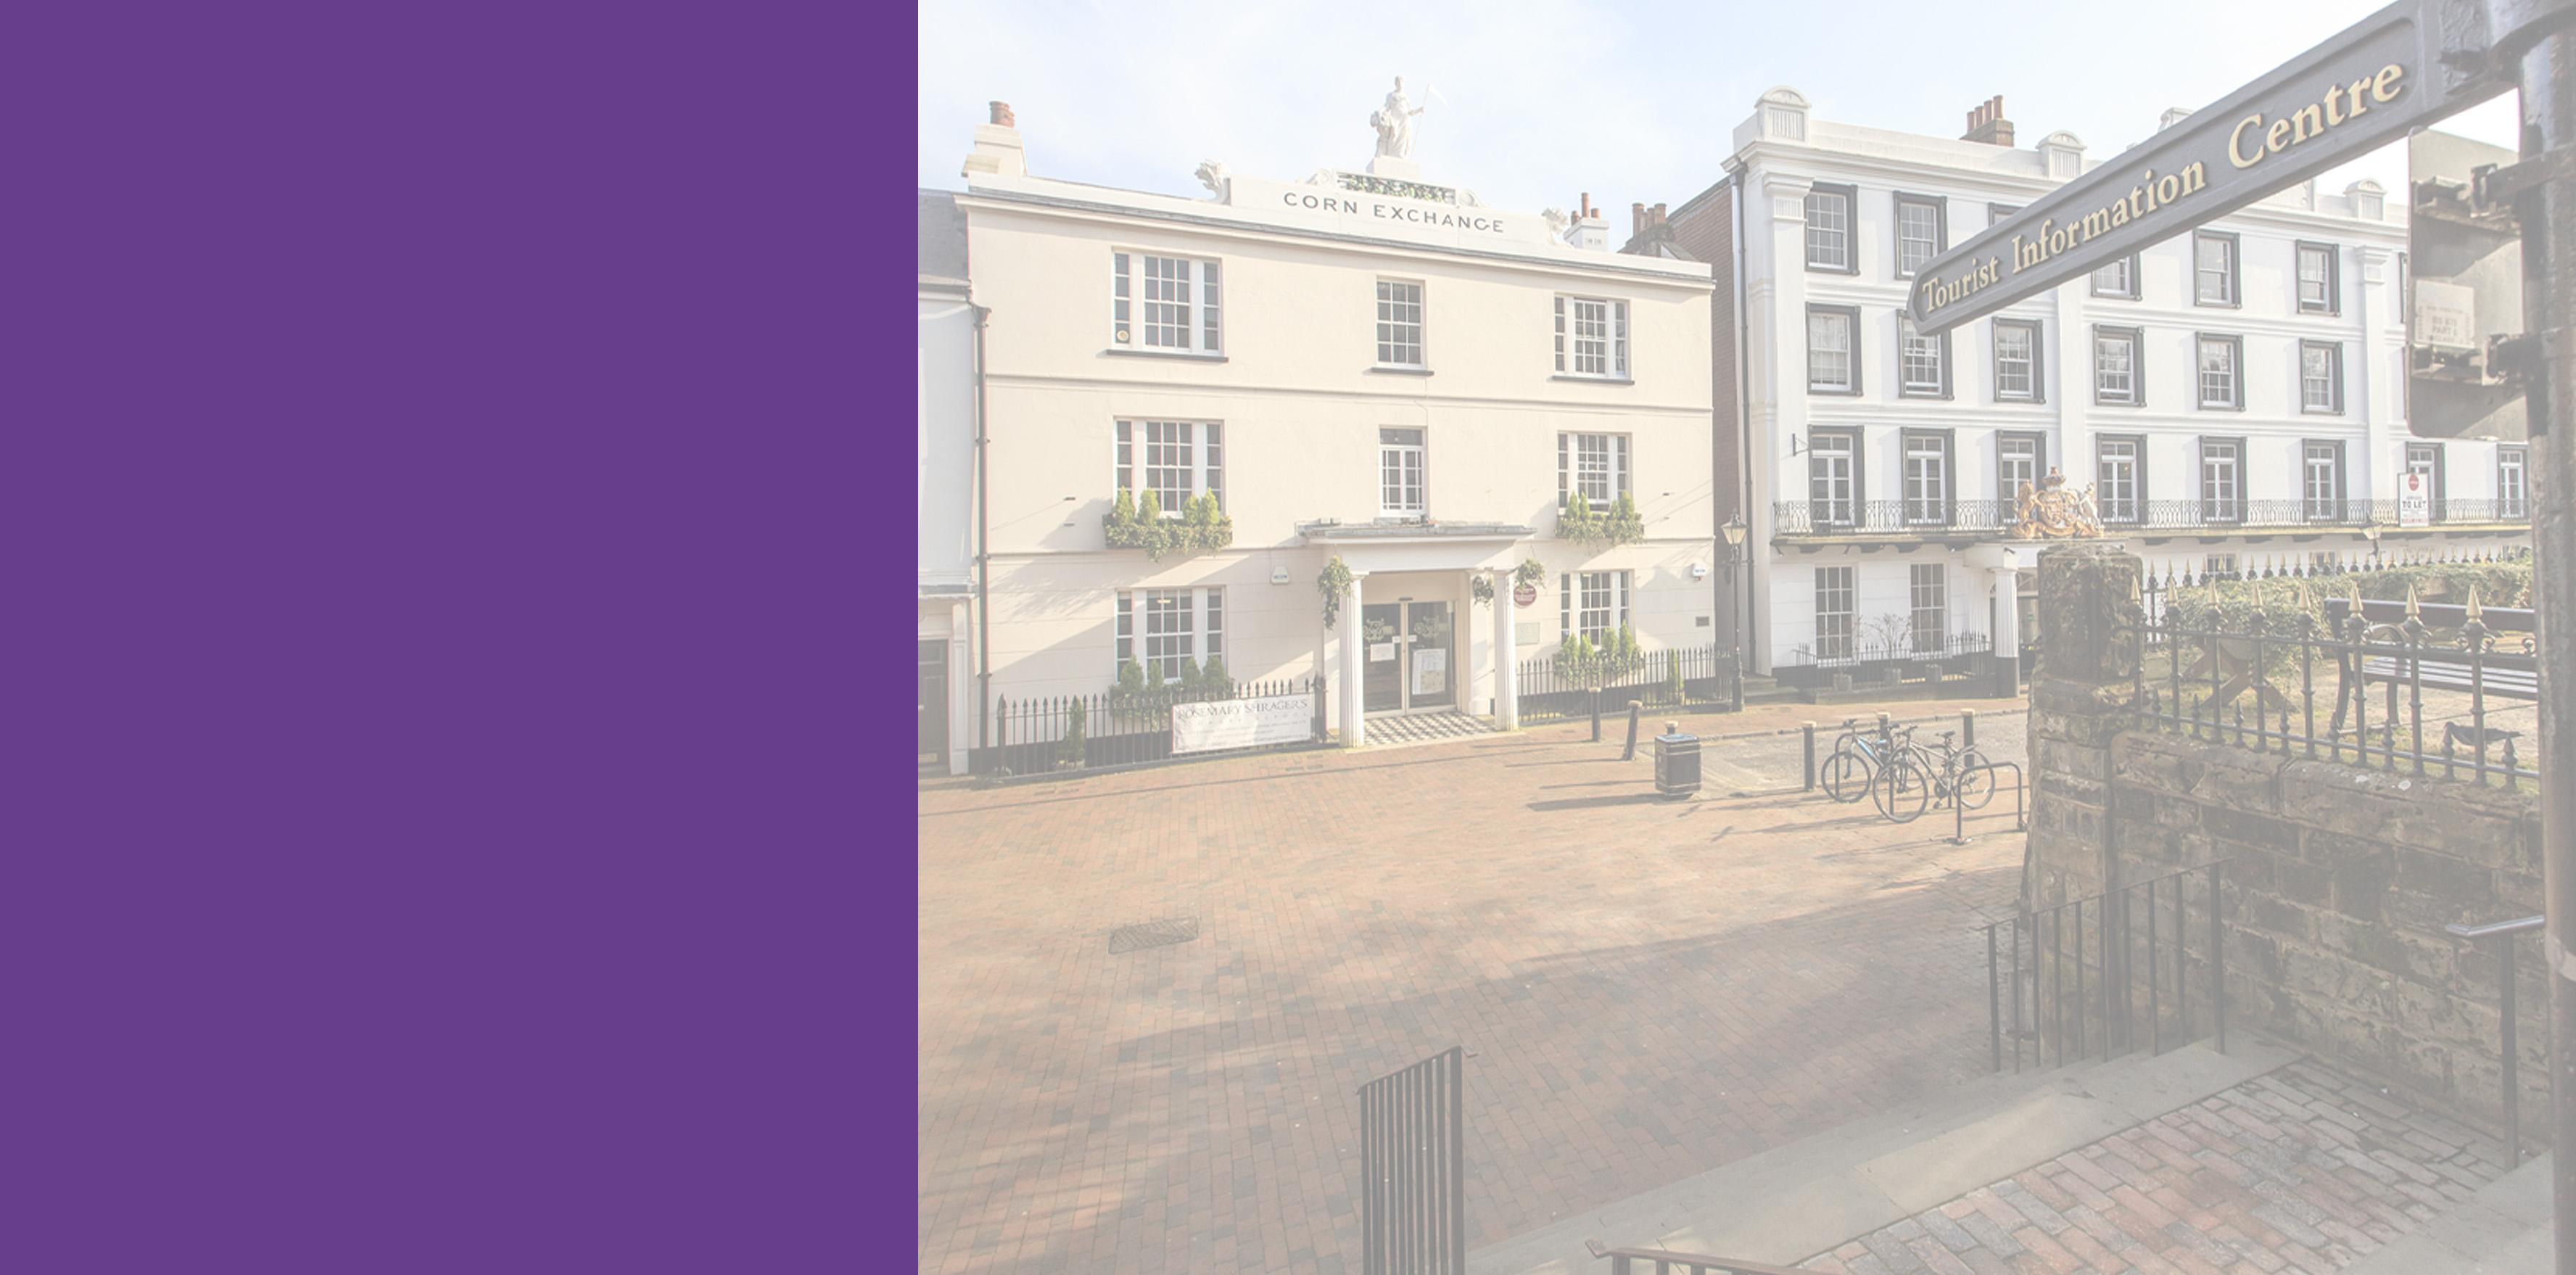 About us - Tunbridge Wells tourist information